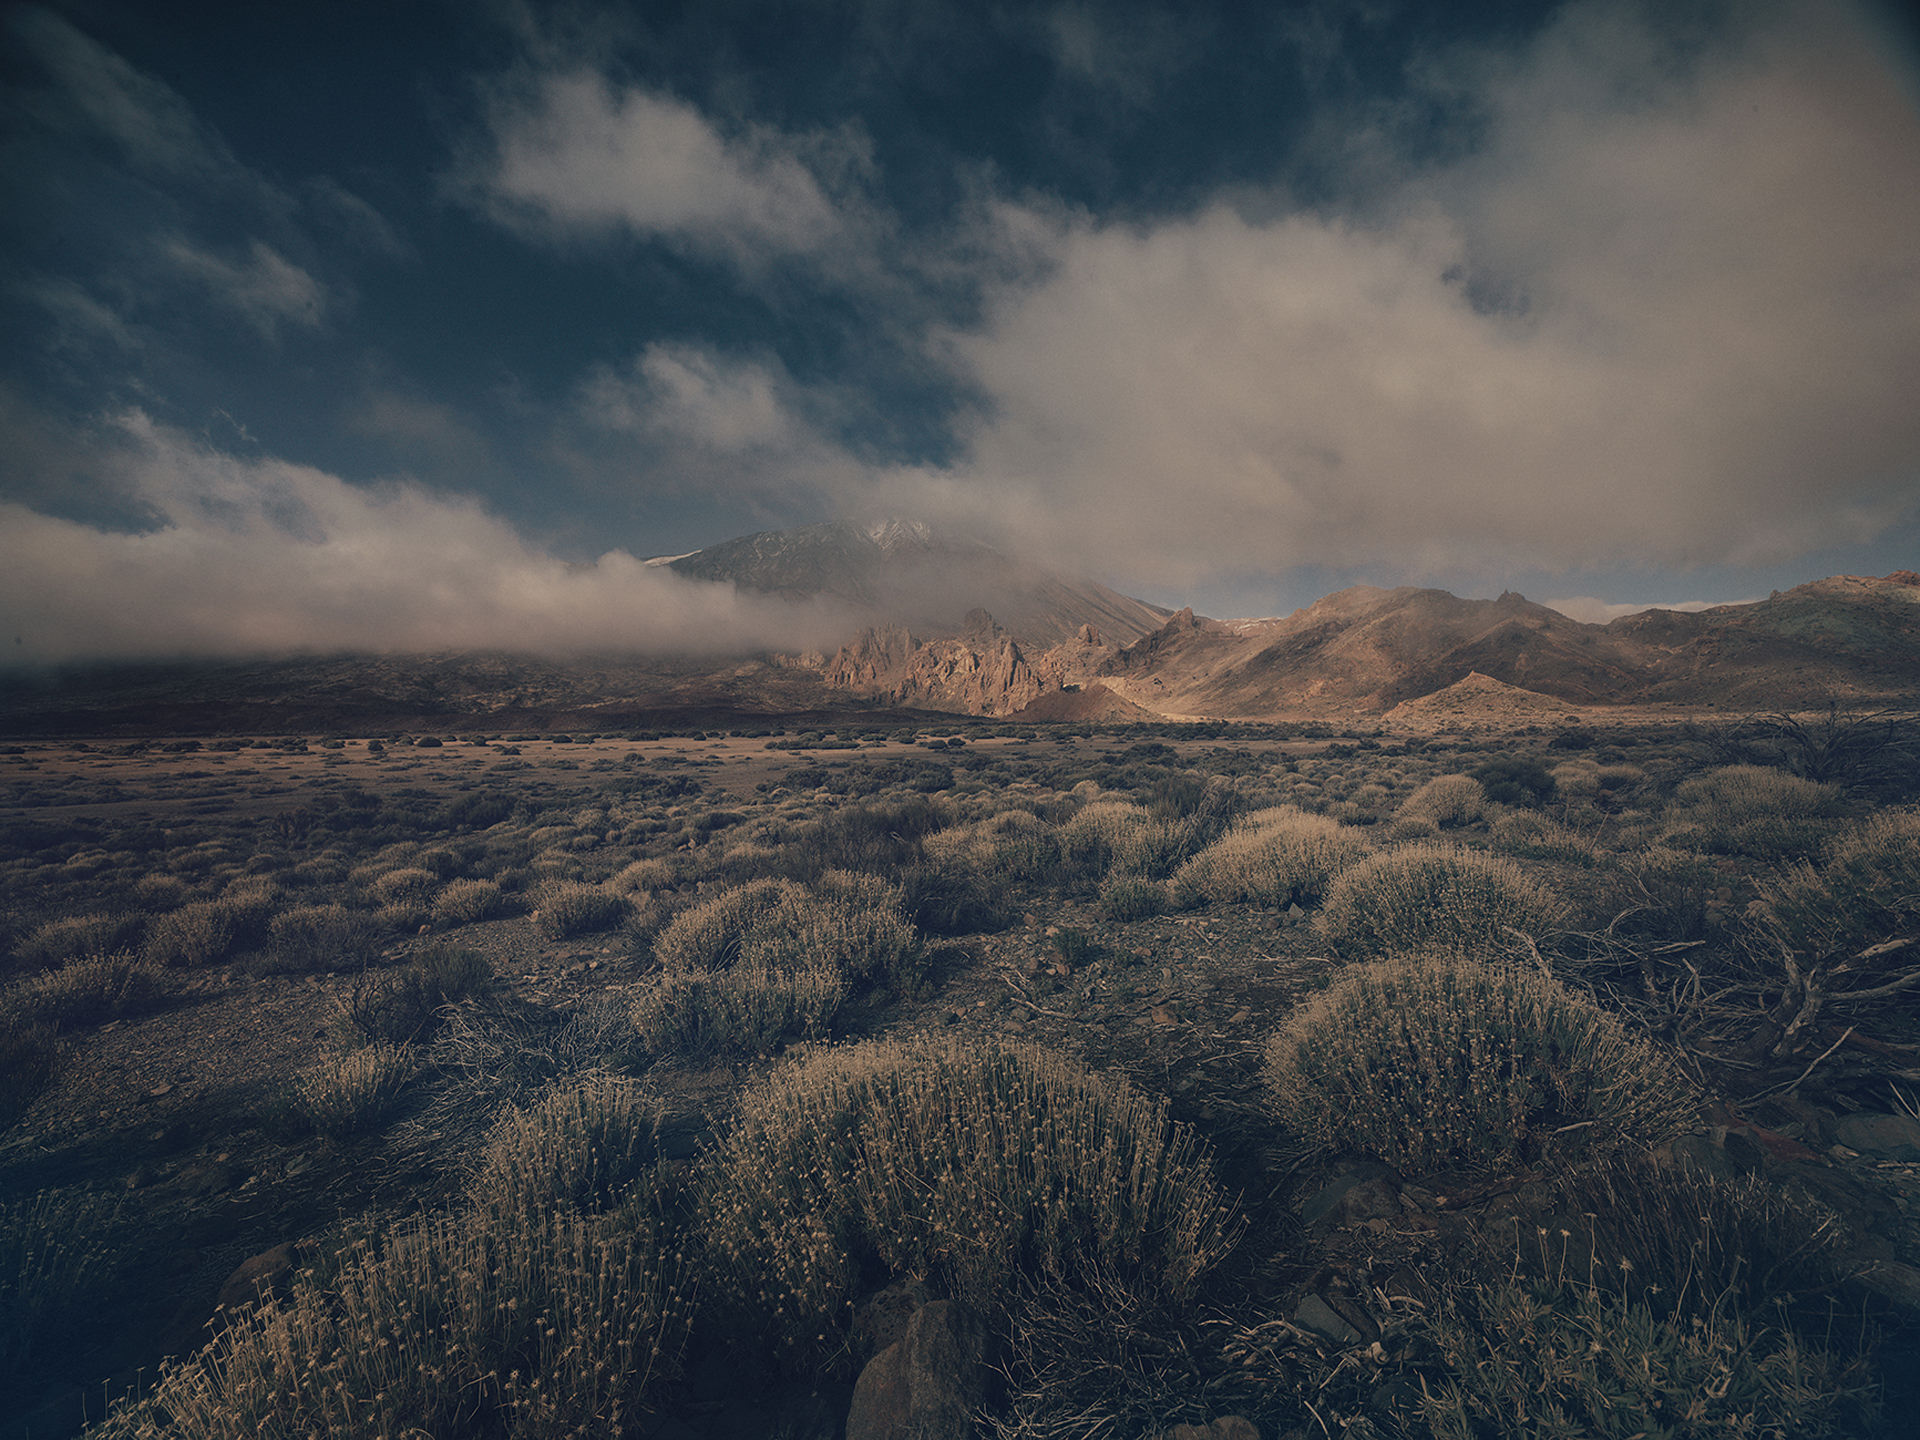 ©ankeluckmann1558, gosee awards, gold , anke luckmann, www.ankeluckmann.com, landscape, volcanic, trey, personal project